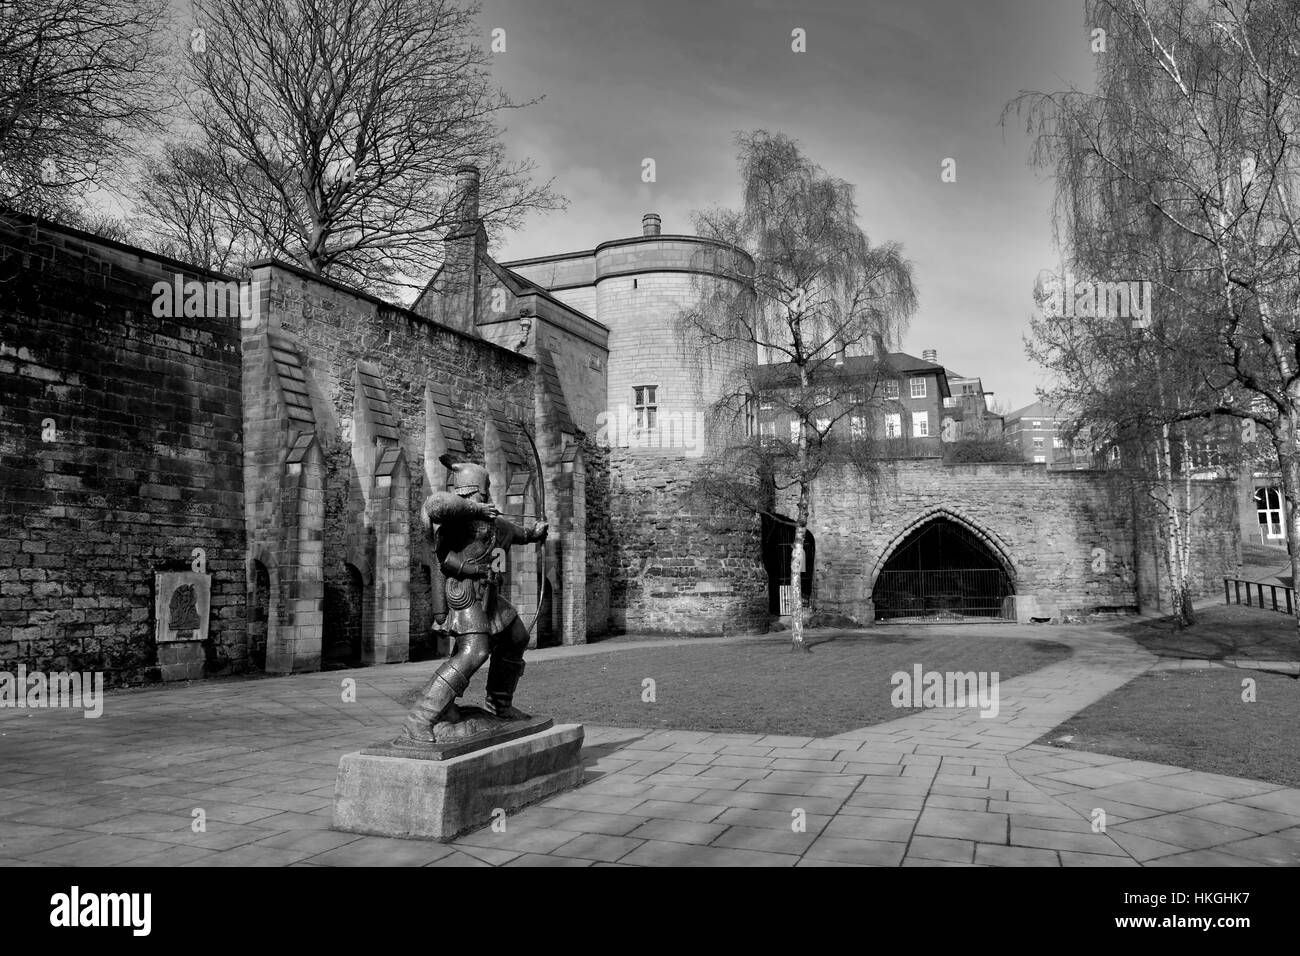 Statue of Robin Hood outside Nottingham Castle, Nottingham city centre, Nottinghamshire, England, UK - Stock Image